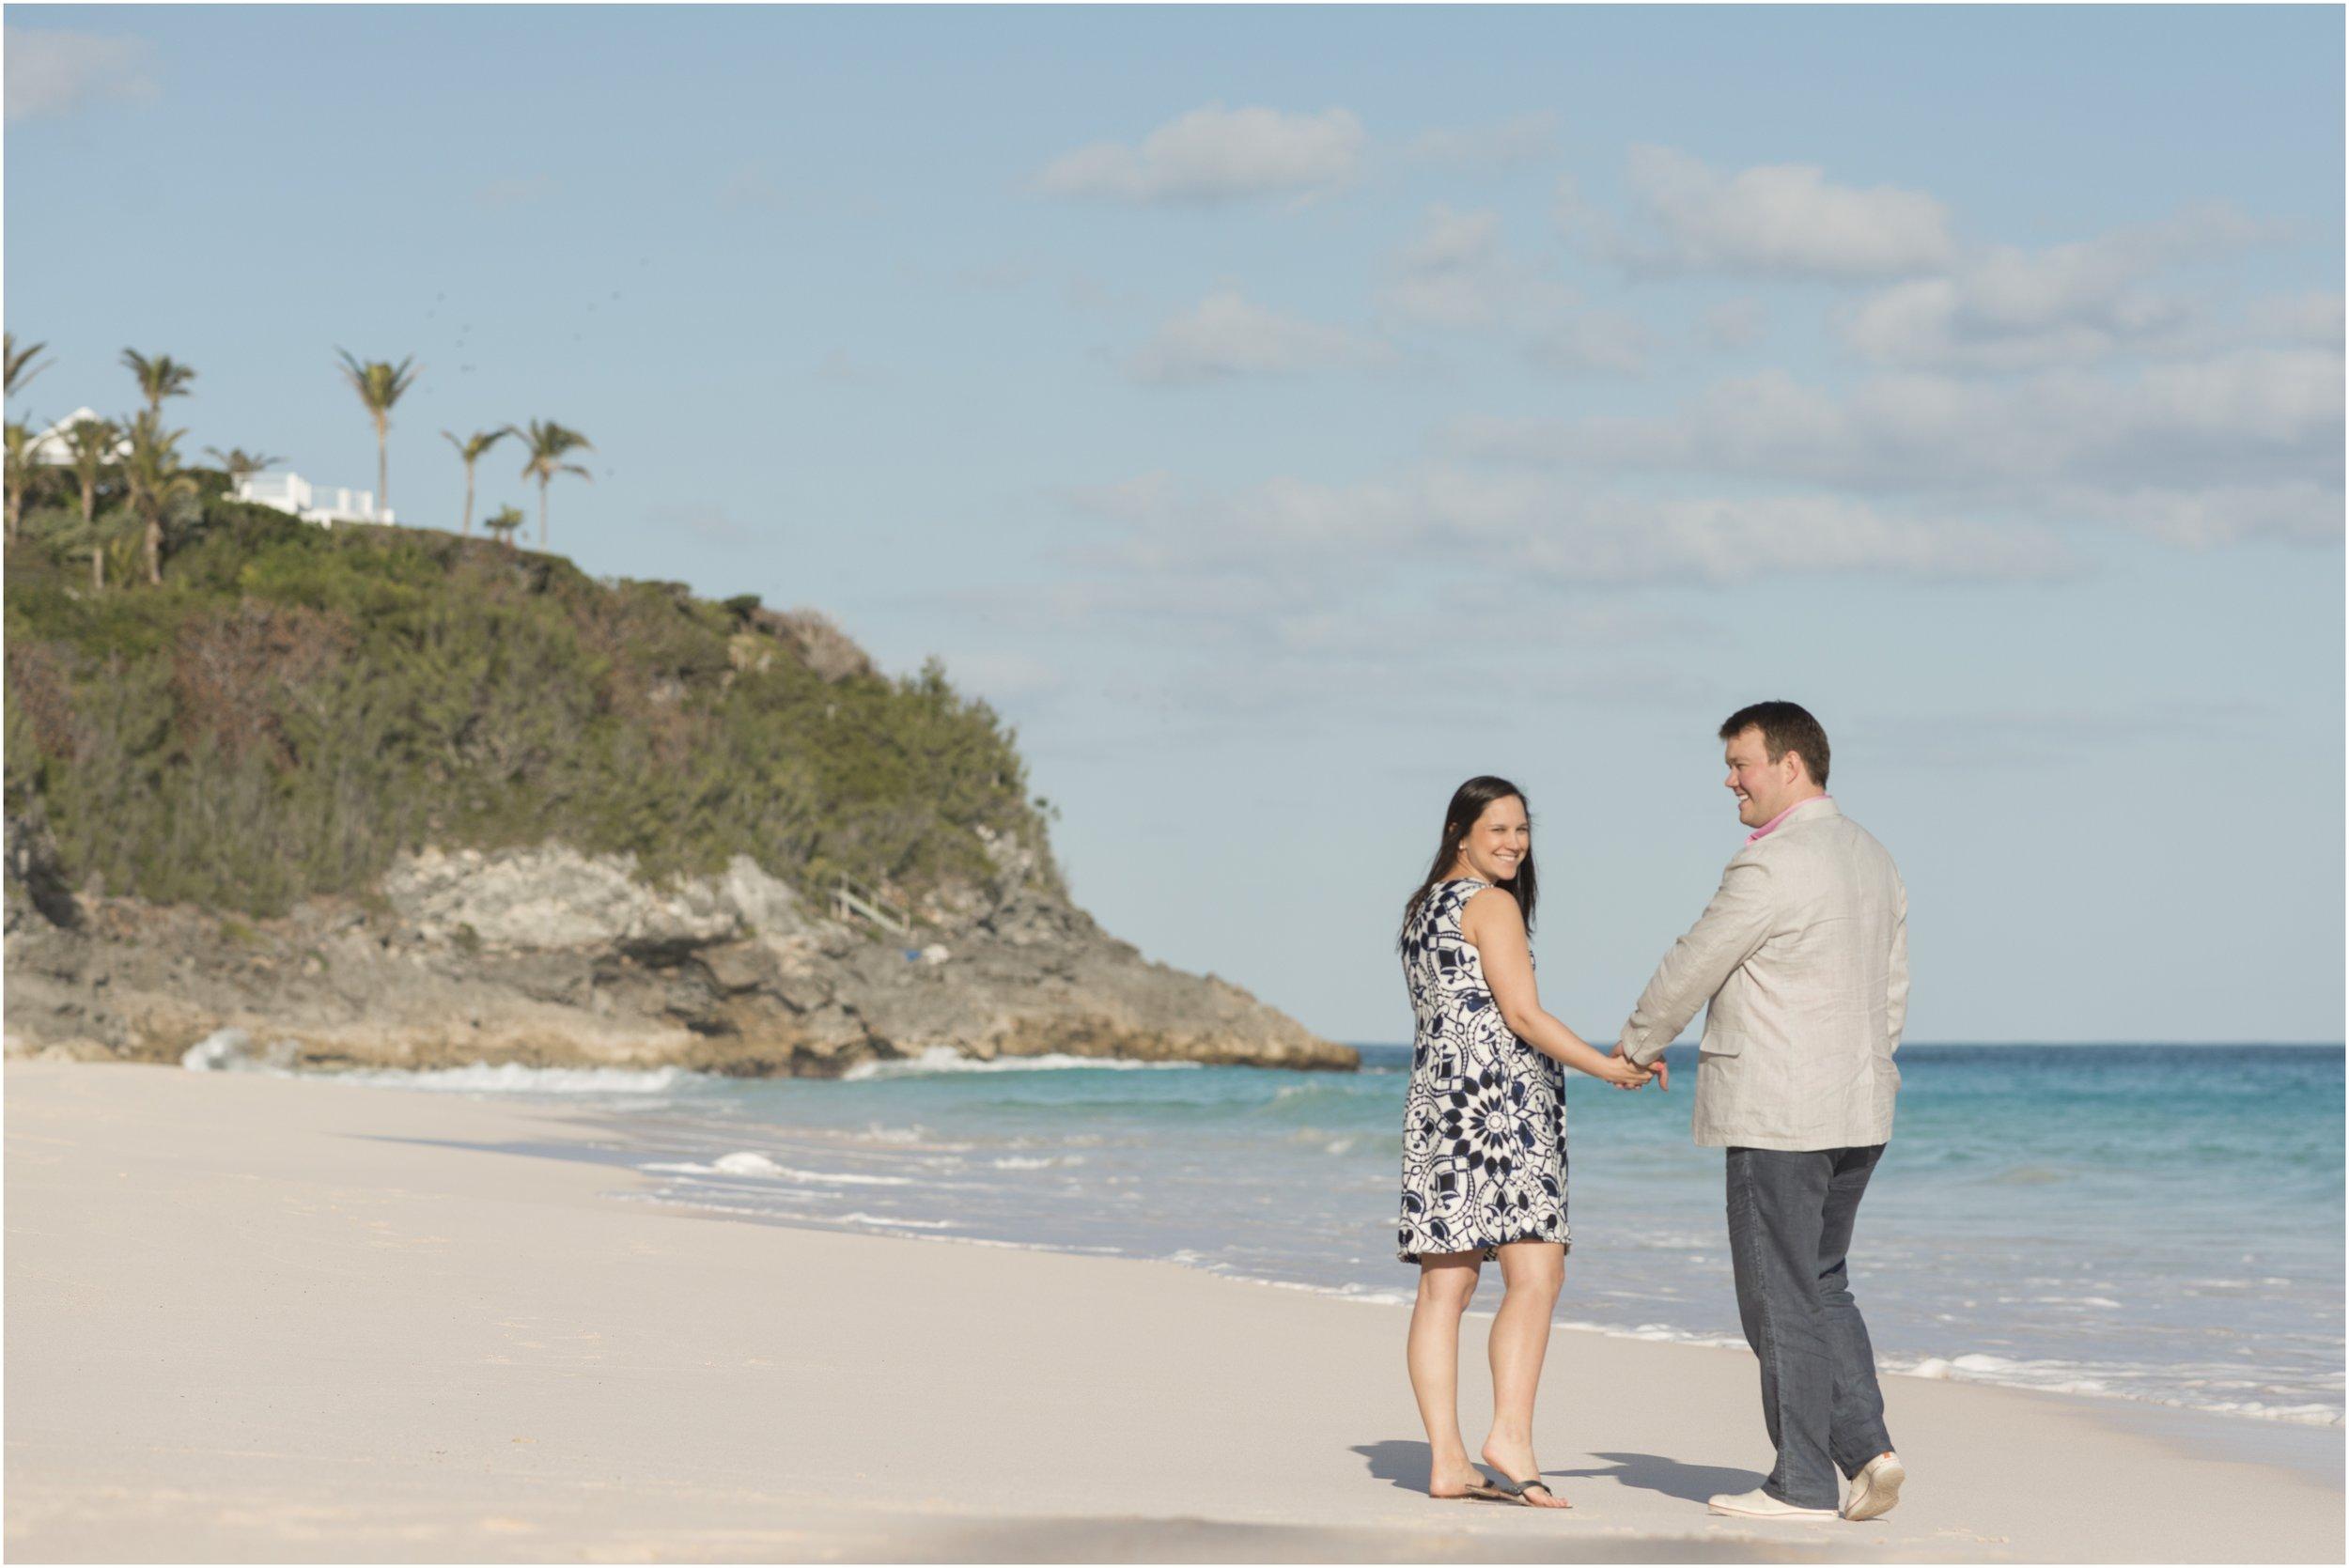 ©Melanie Fiander of FianderFoto_Ashley_James_Babymoon in Bermuda_5.jpg